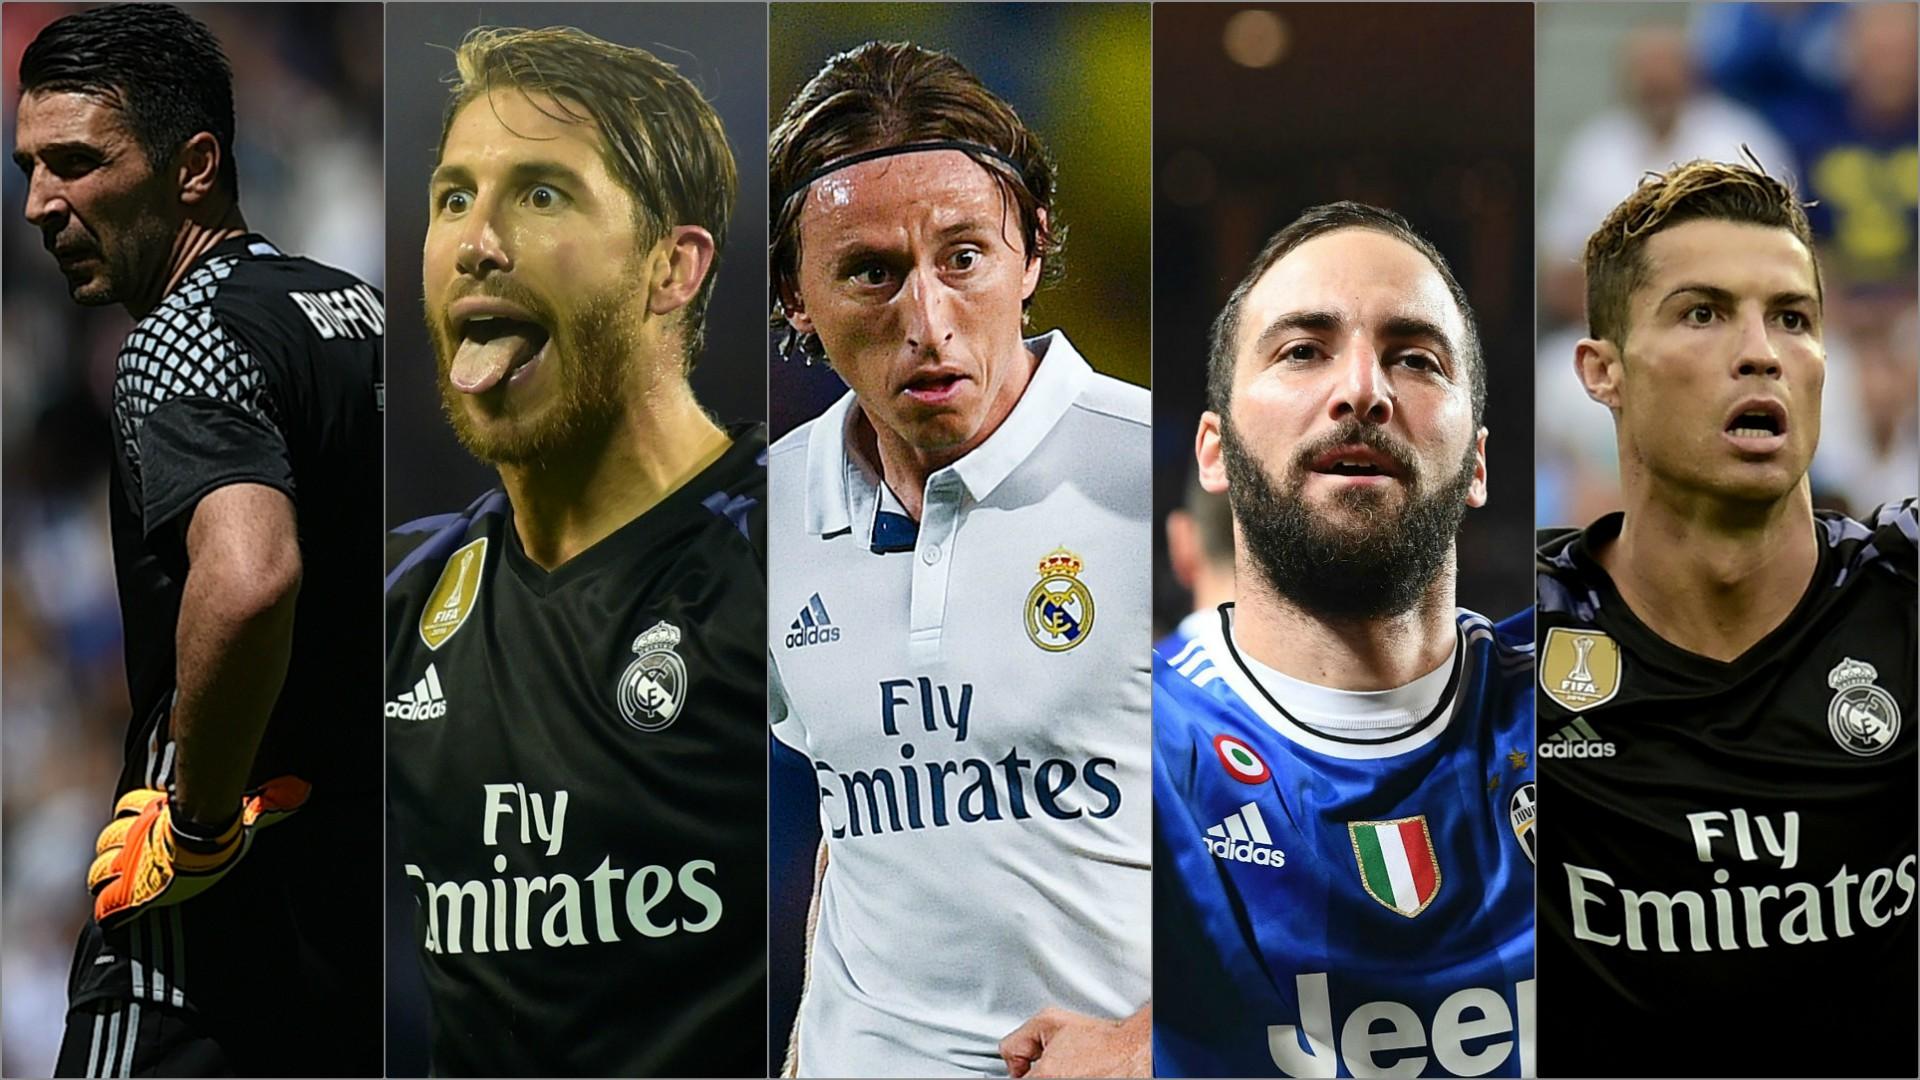 Le Real Madrid triomphe 4-1 contre la Juventus